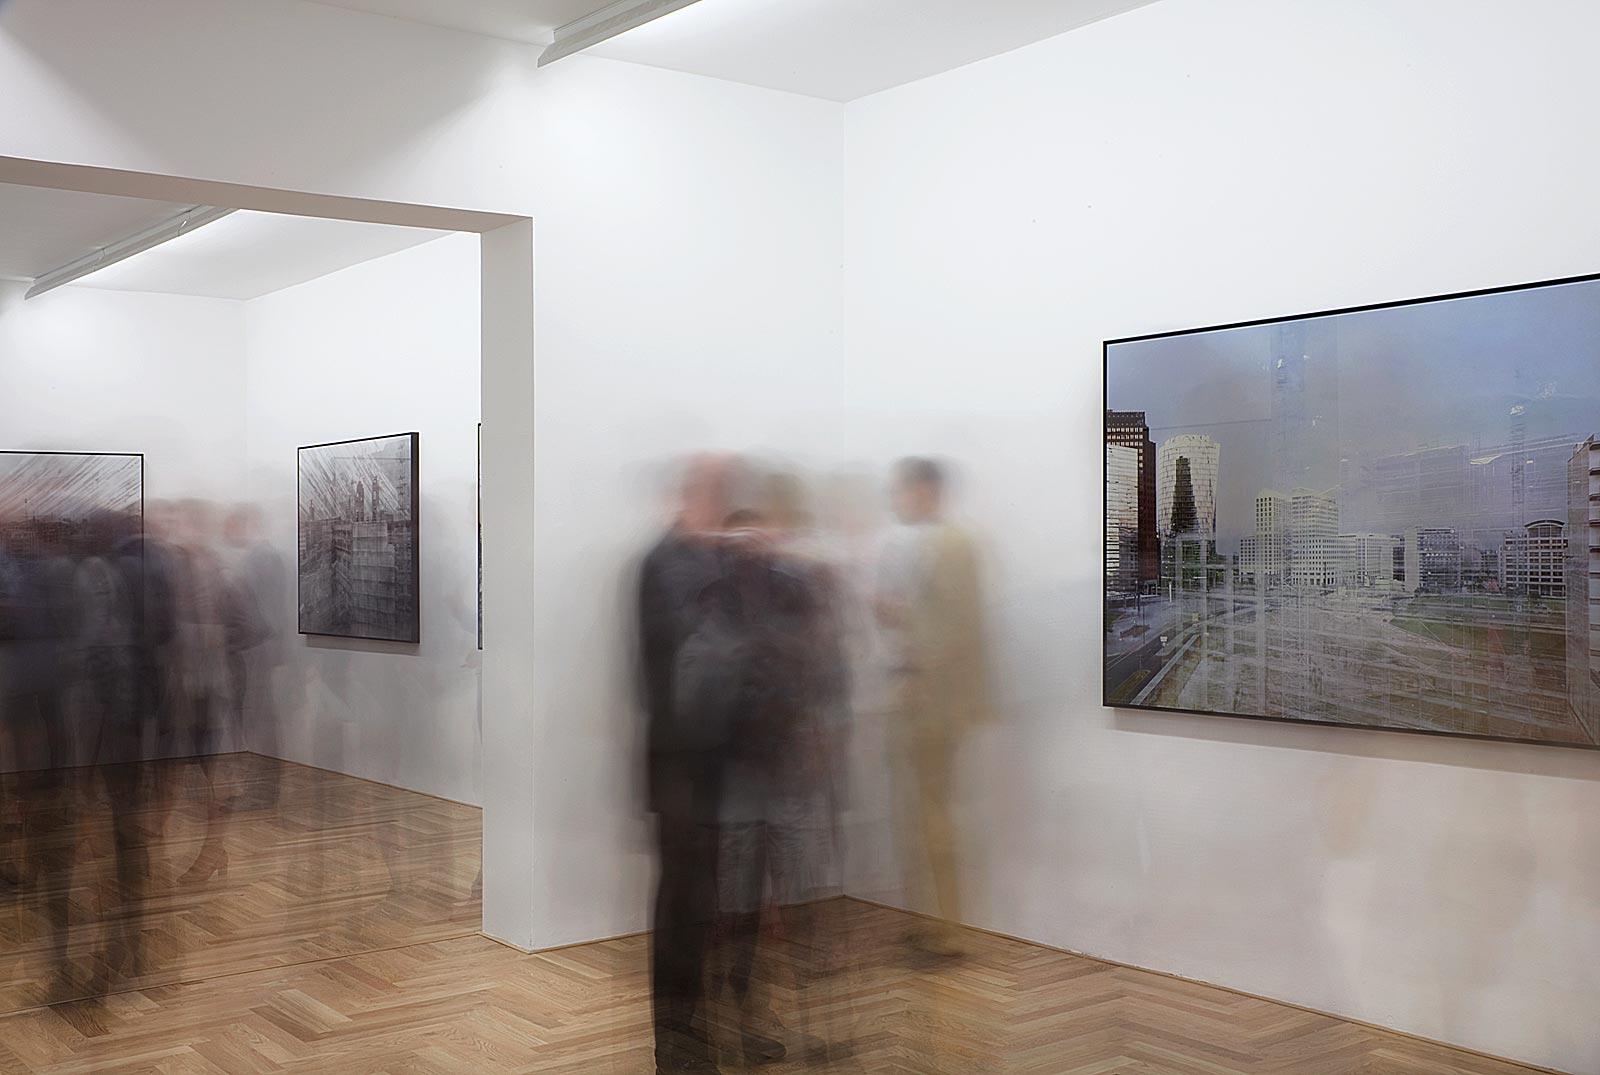 Galerie Fahnemann Berlin (19.04 - 19.13 Uhr, 20.5.2011)